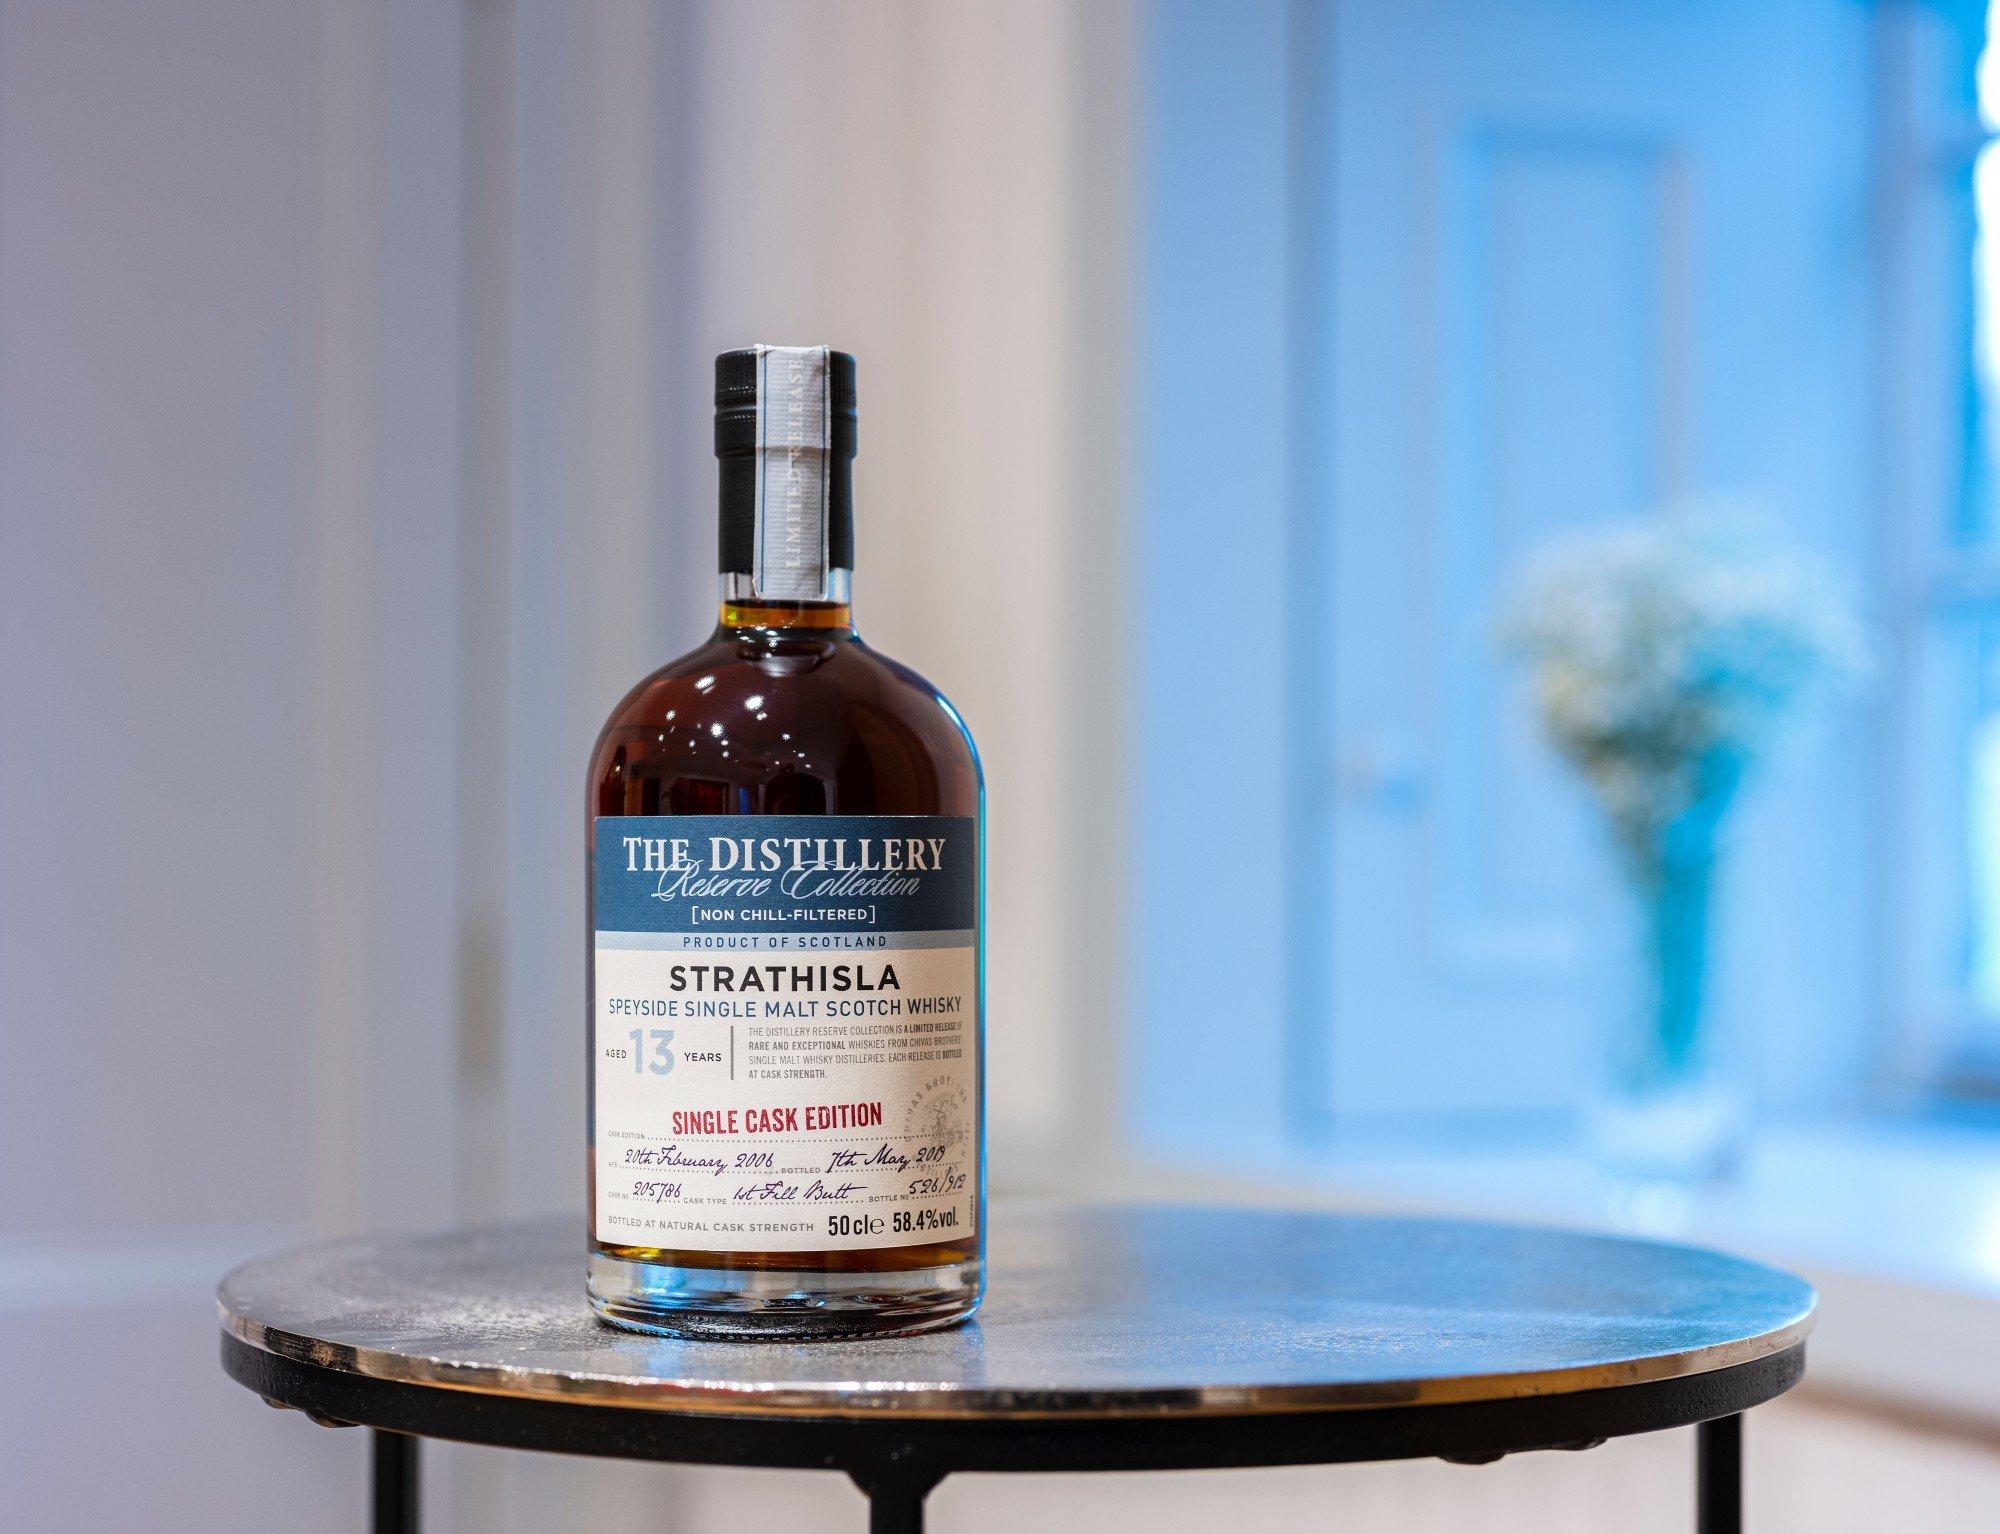 Strathisla 13 Year Old Single Malt Whisky